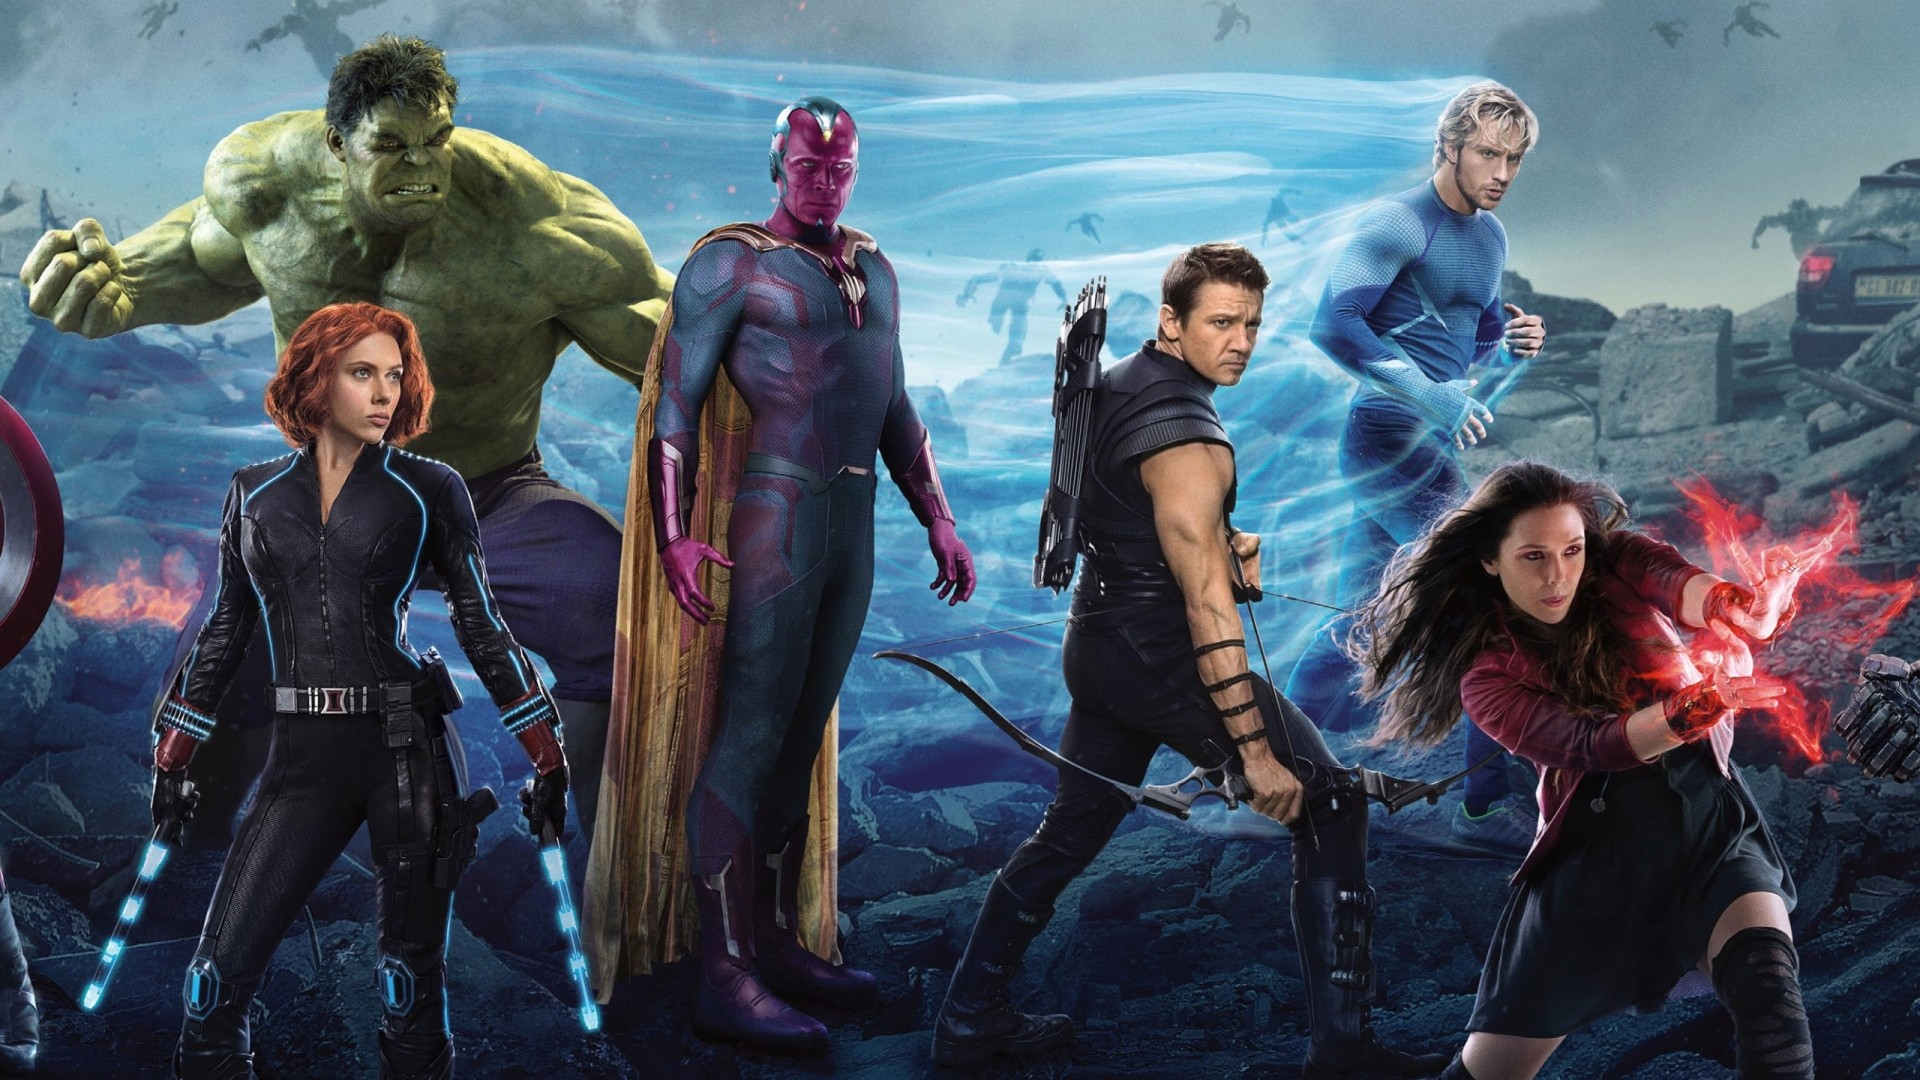 Wallpaper avengers, avengers age of ultron, thor, captain  america, black widow